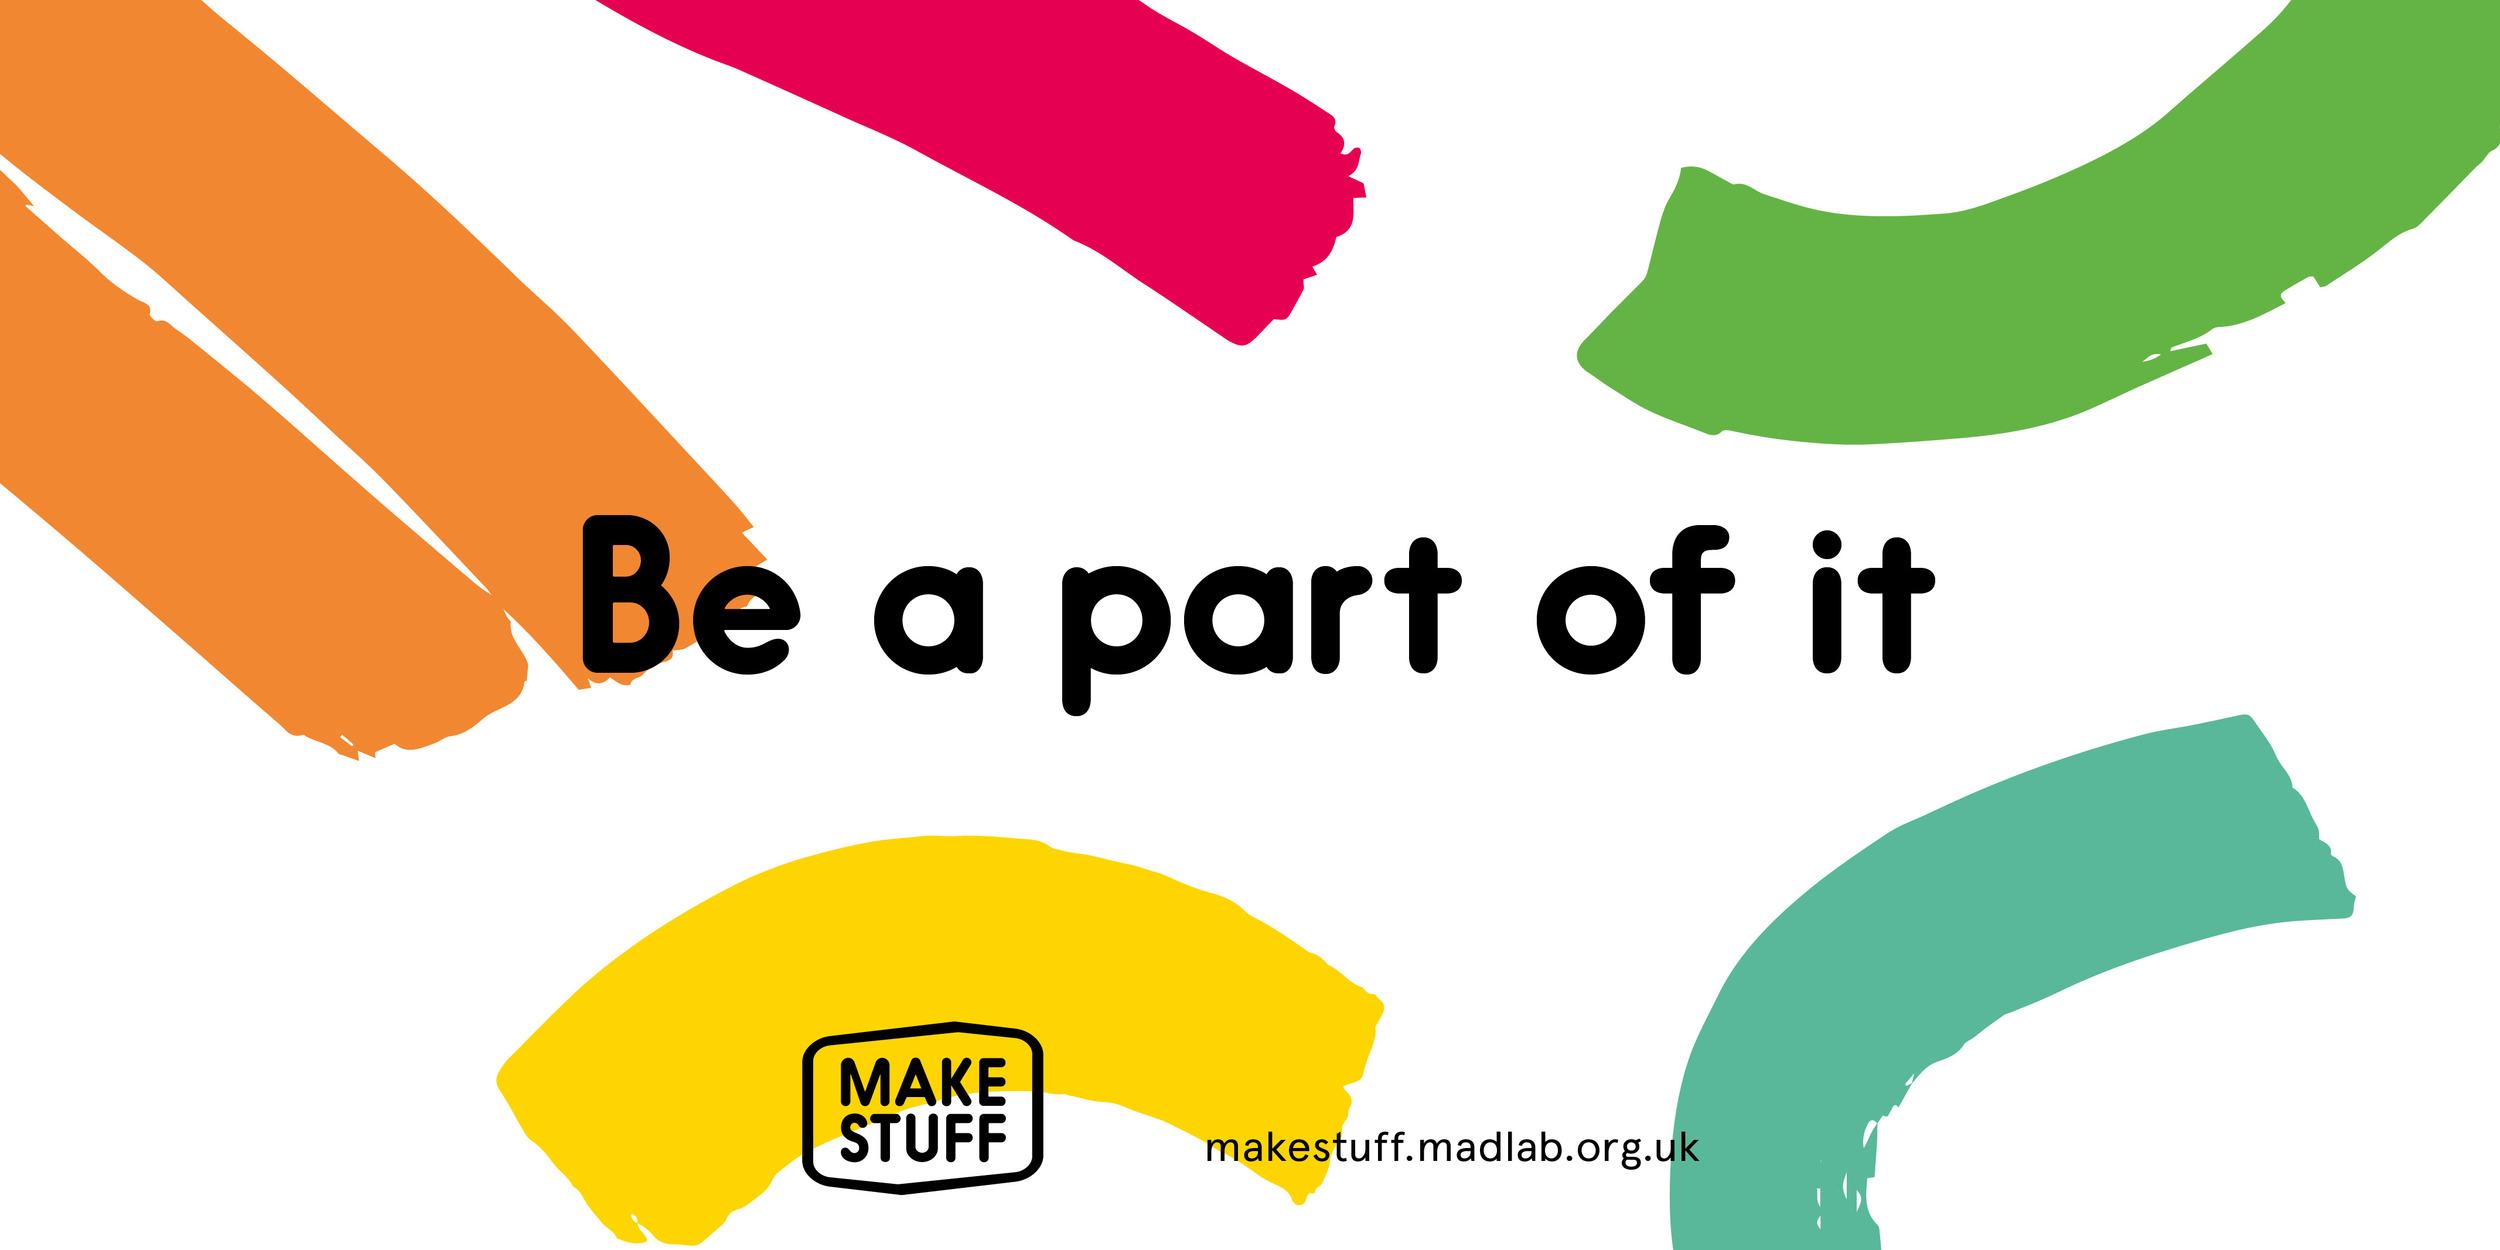 MAKE STUFF web banner be a part of it.jpg